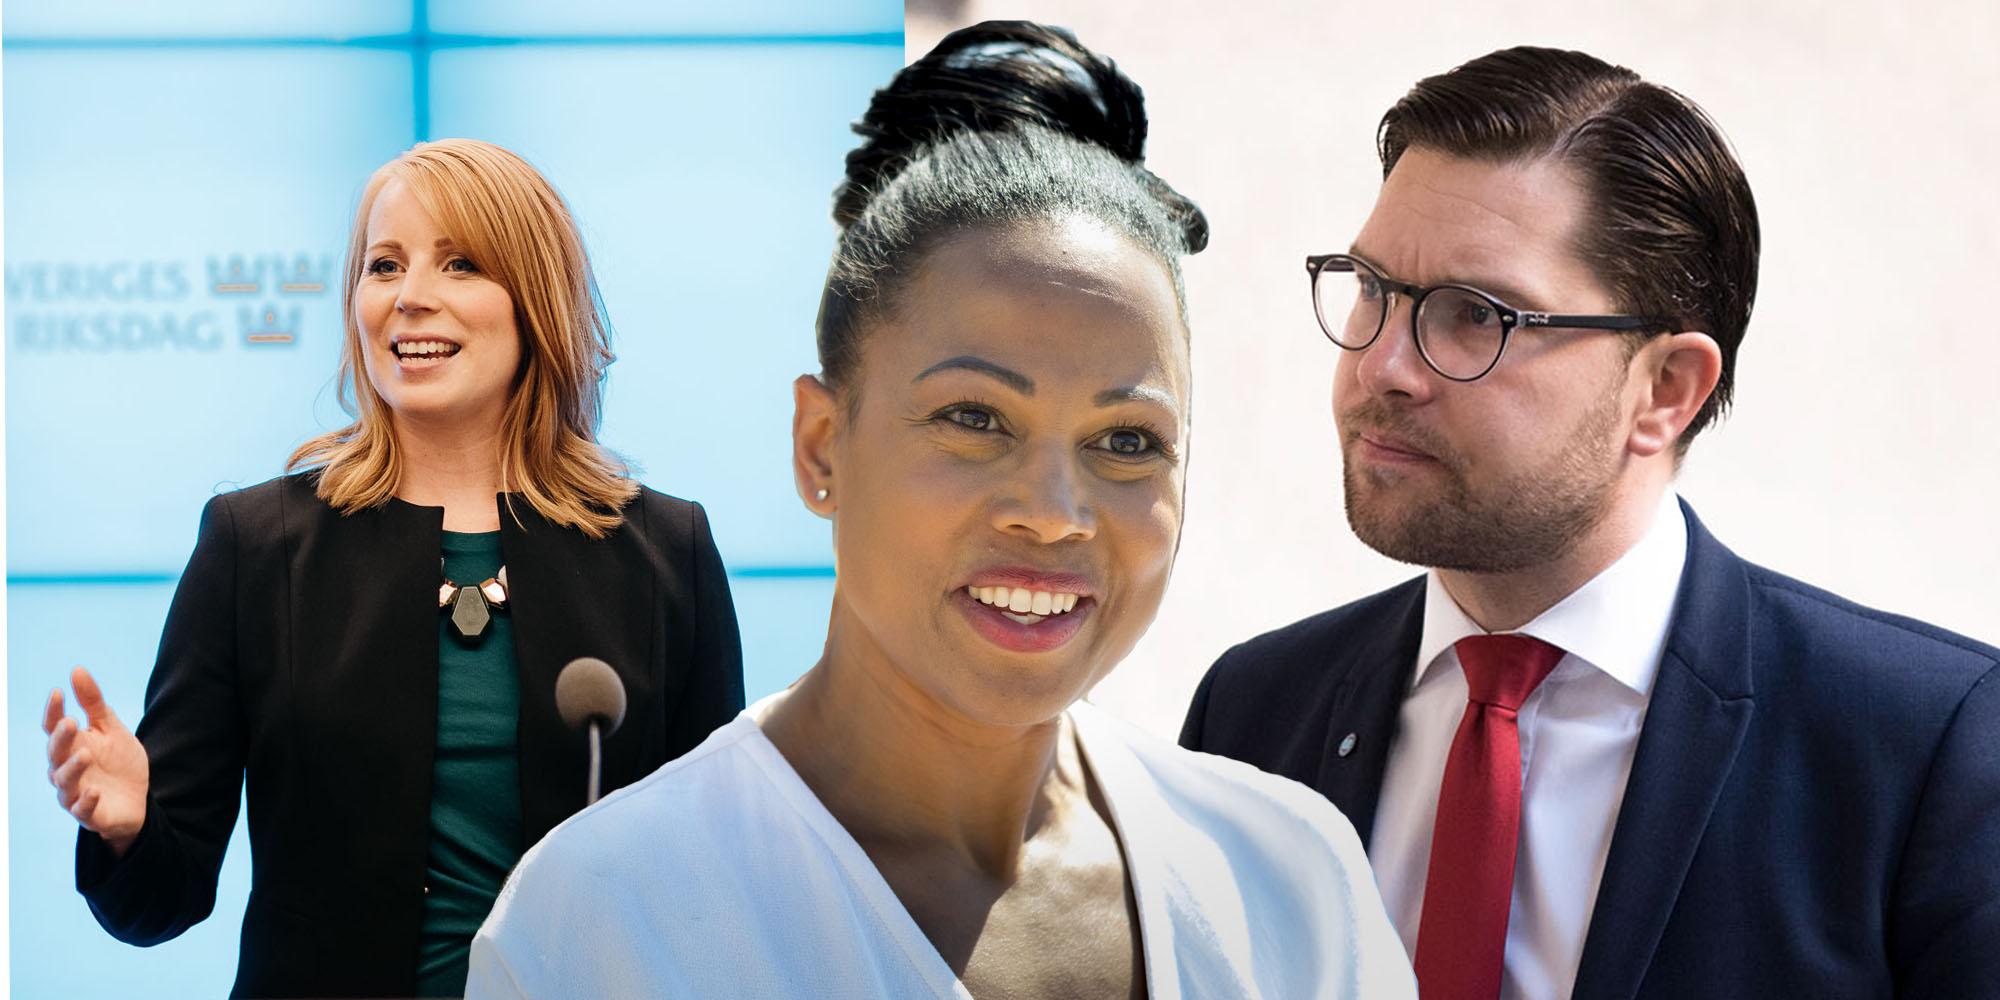 Sverigedemokraterna politik